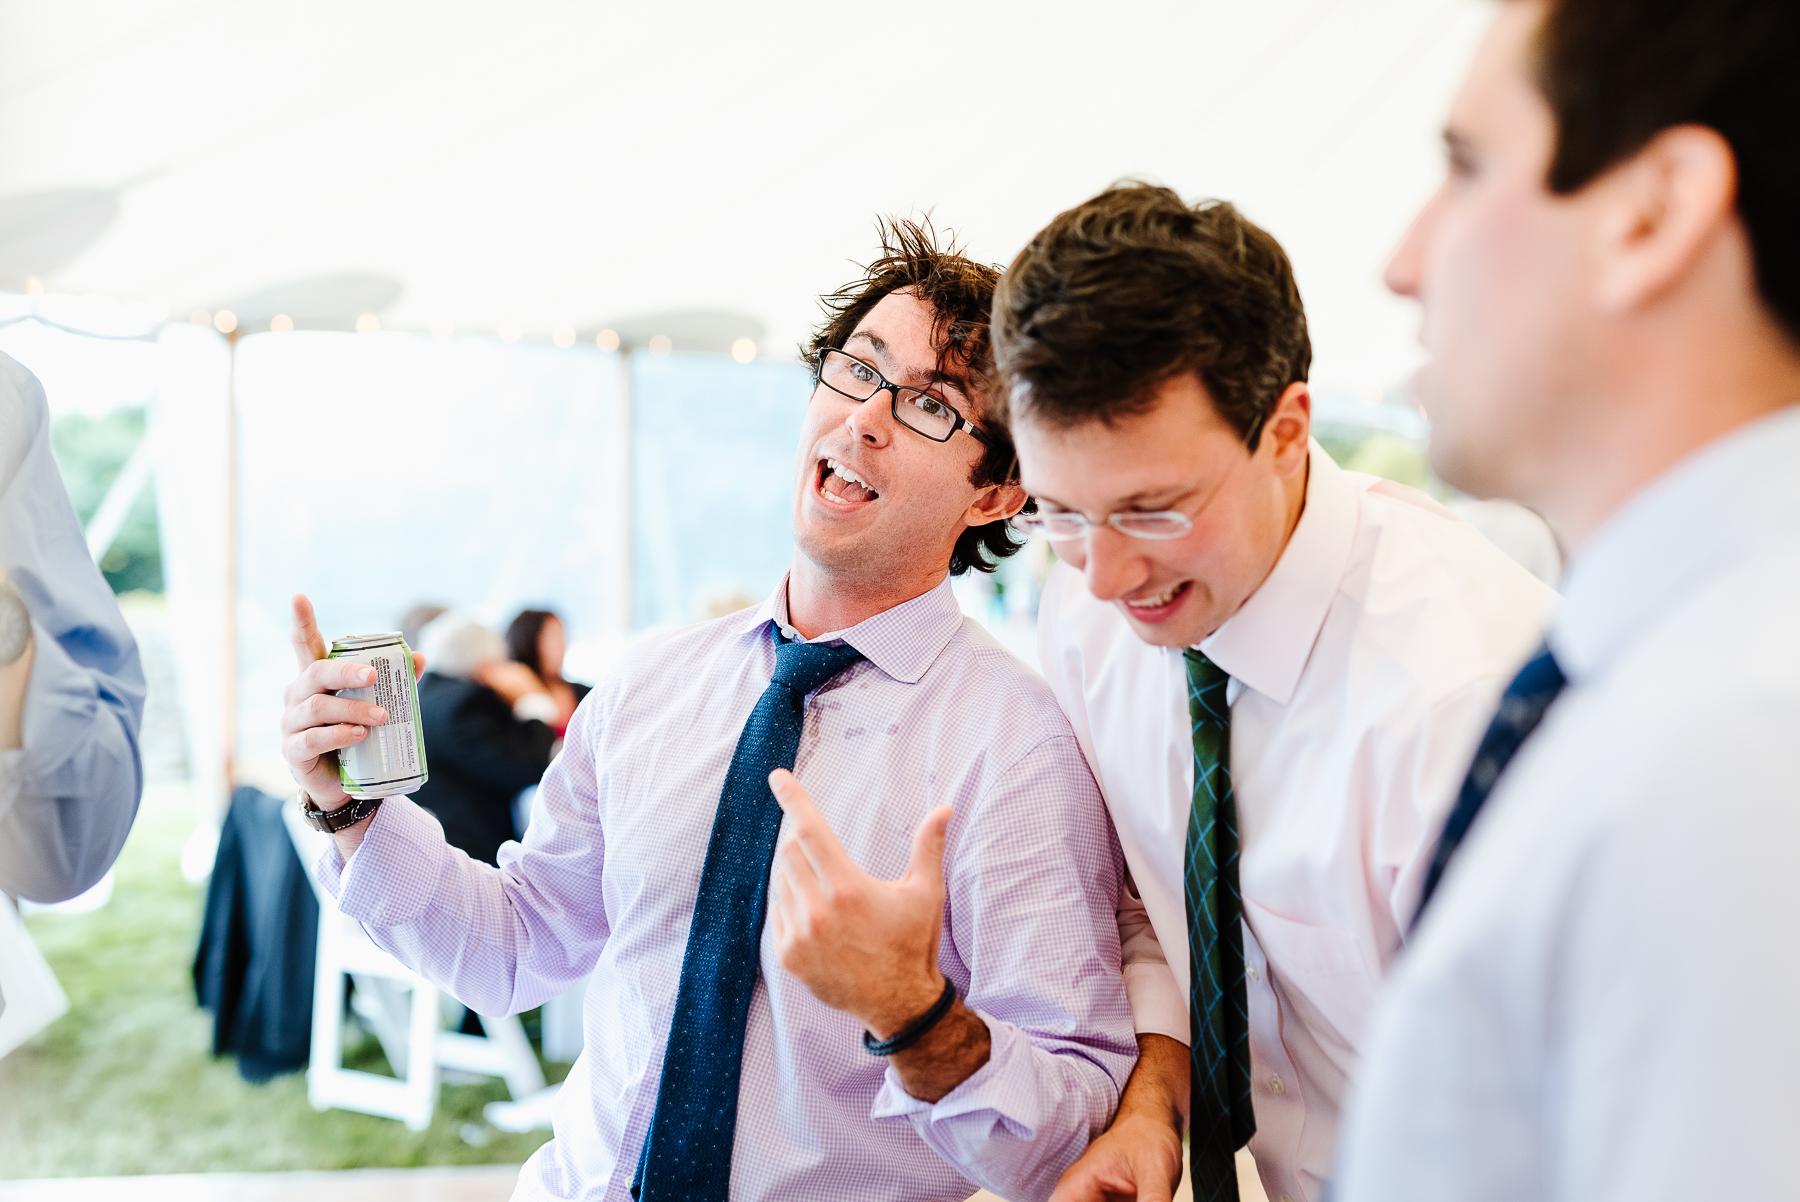 105-J Crew Wedding New Jersey Wedding Photographer J Crew Weddings.jpg